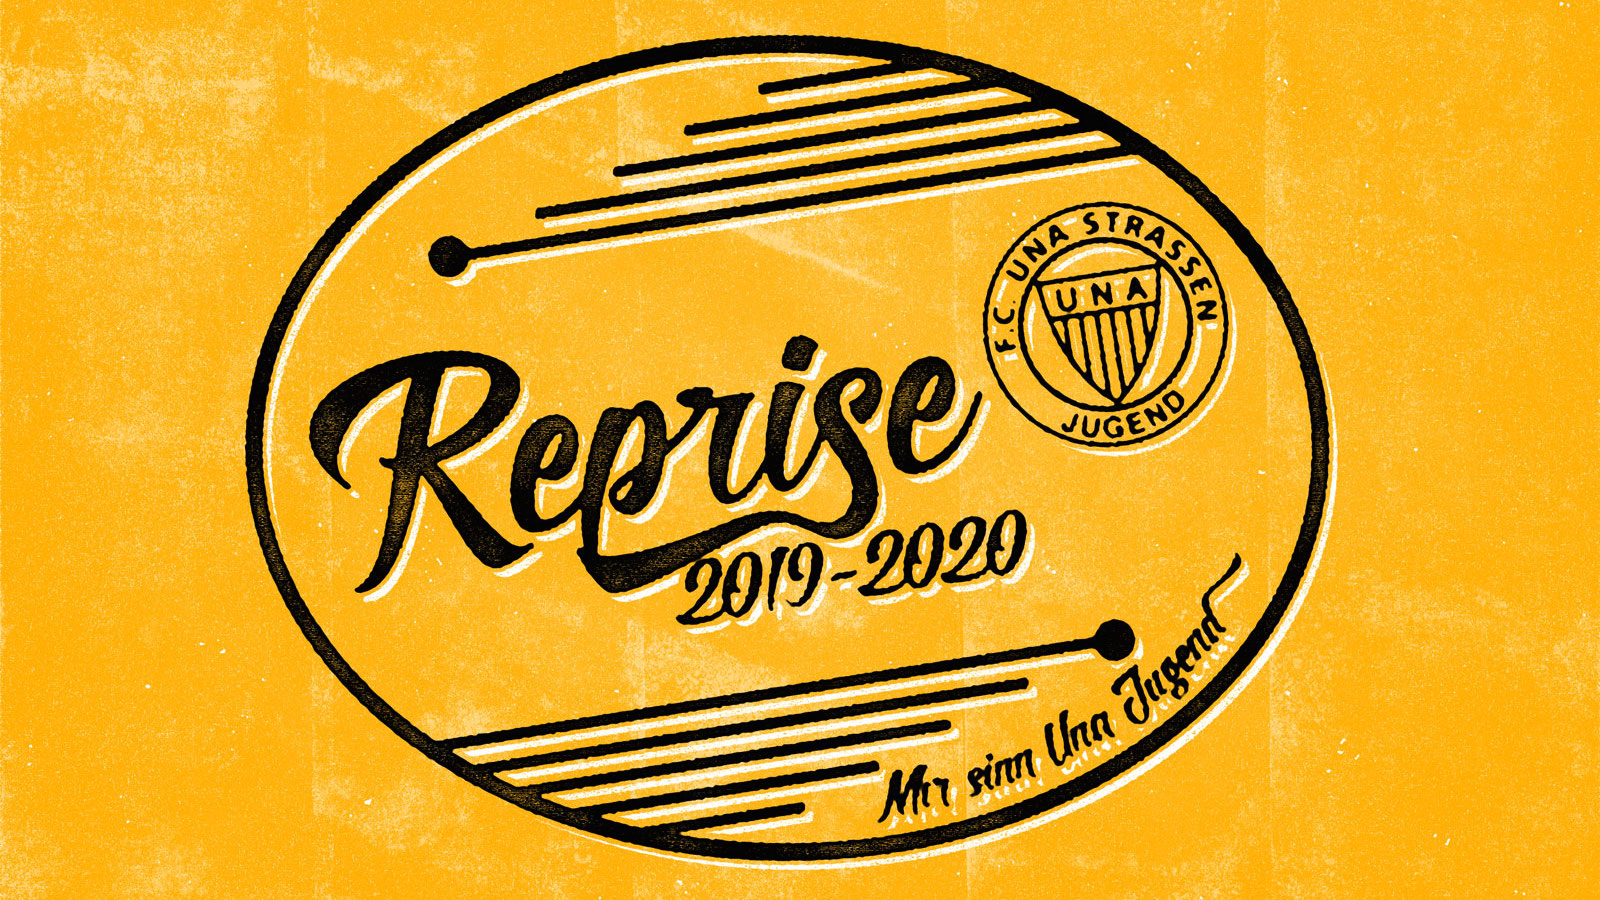 Reprise Jugend 2019-2020